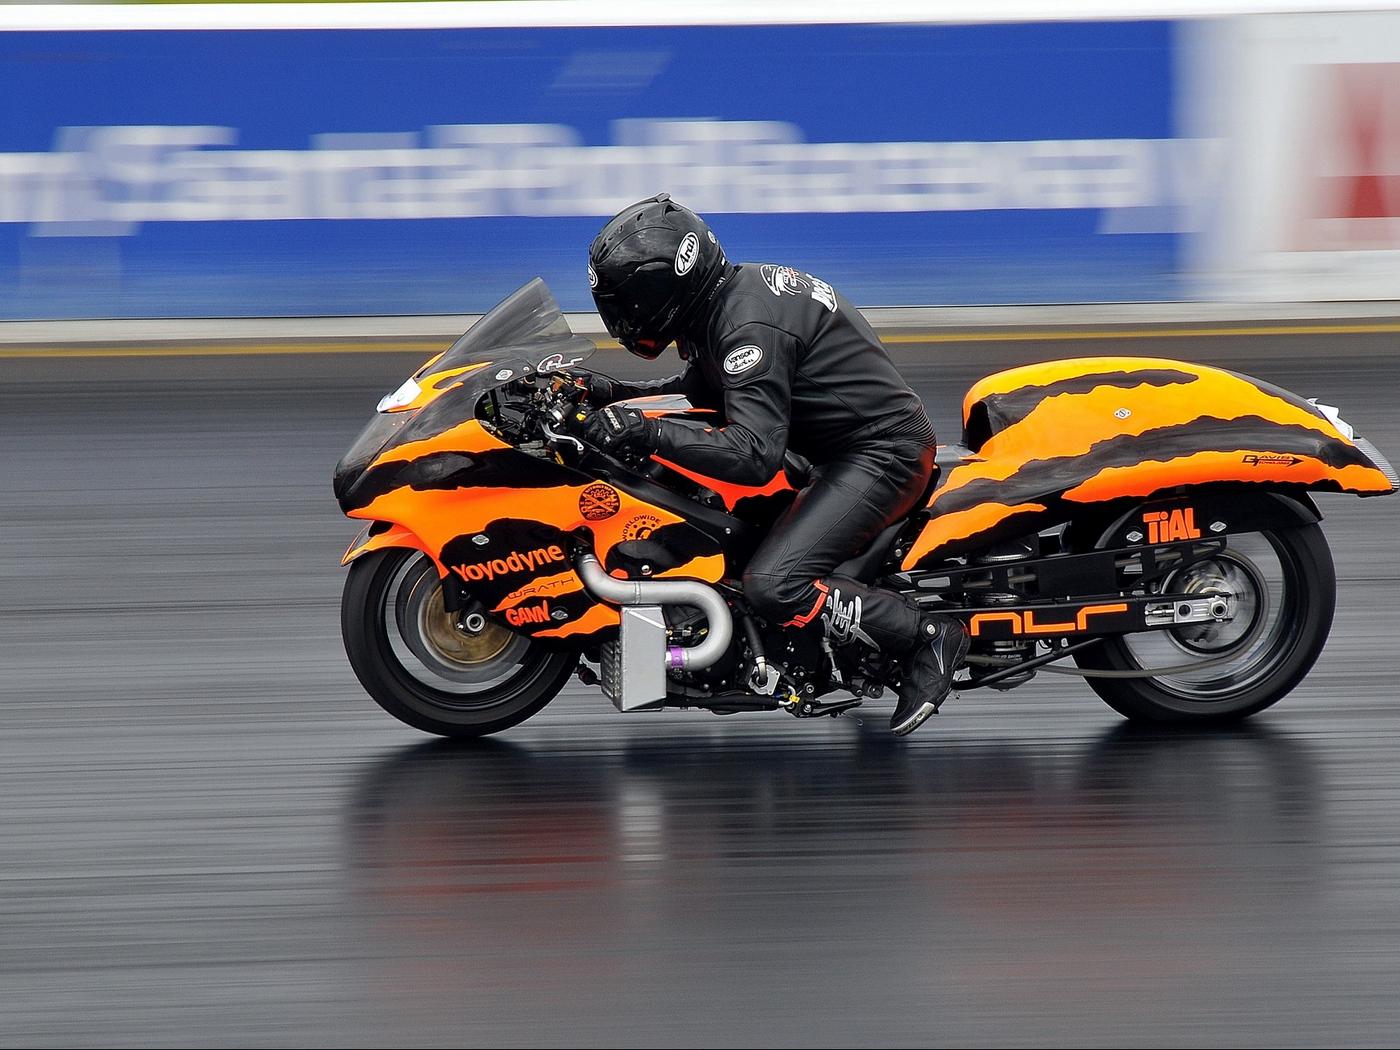 Download wallpaper 1400x1050 motorcycle bike racing sports 1400x1050